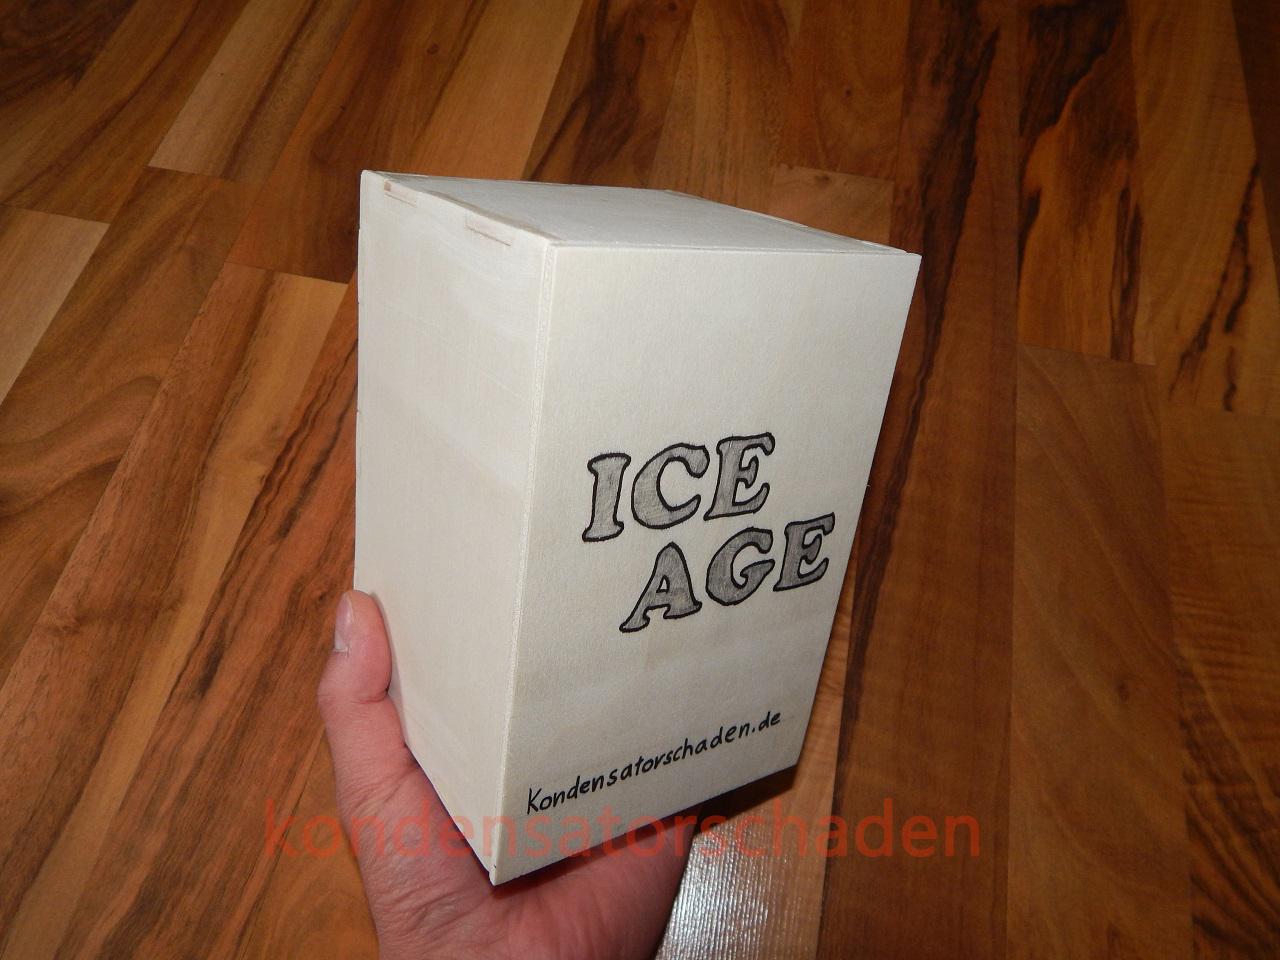 Mini Kühlschrank Selber Bauen Anleitung : How mini kühlschrank selbst gebaut